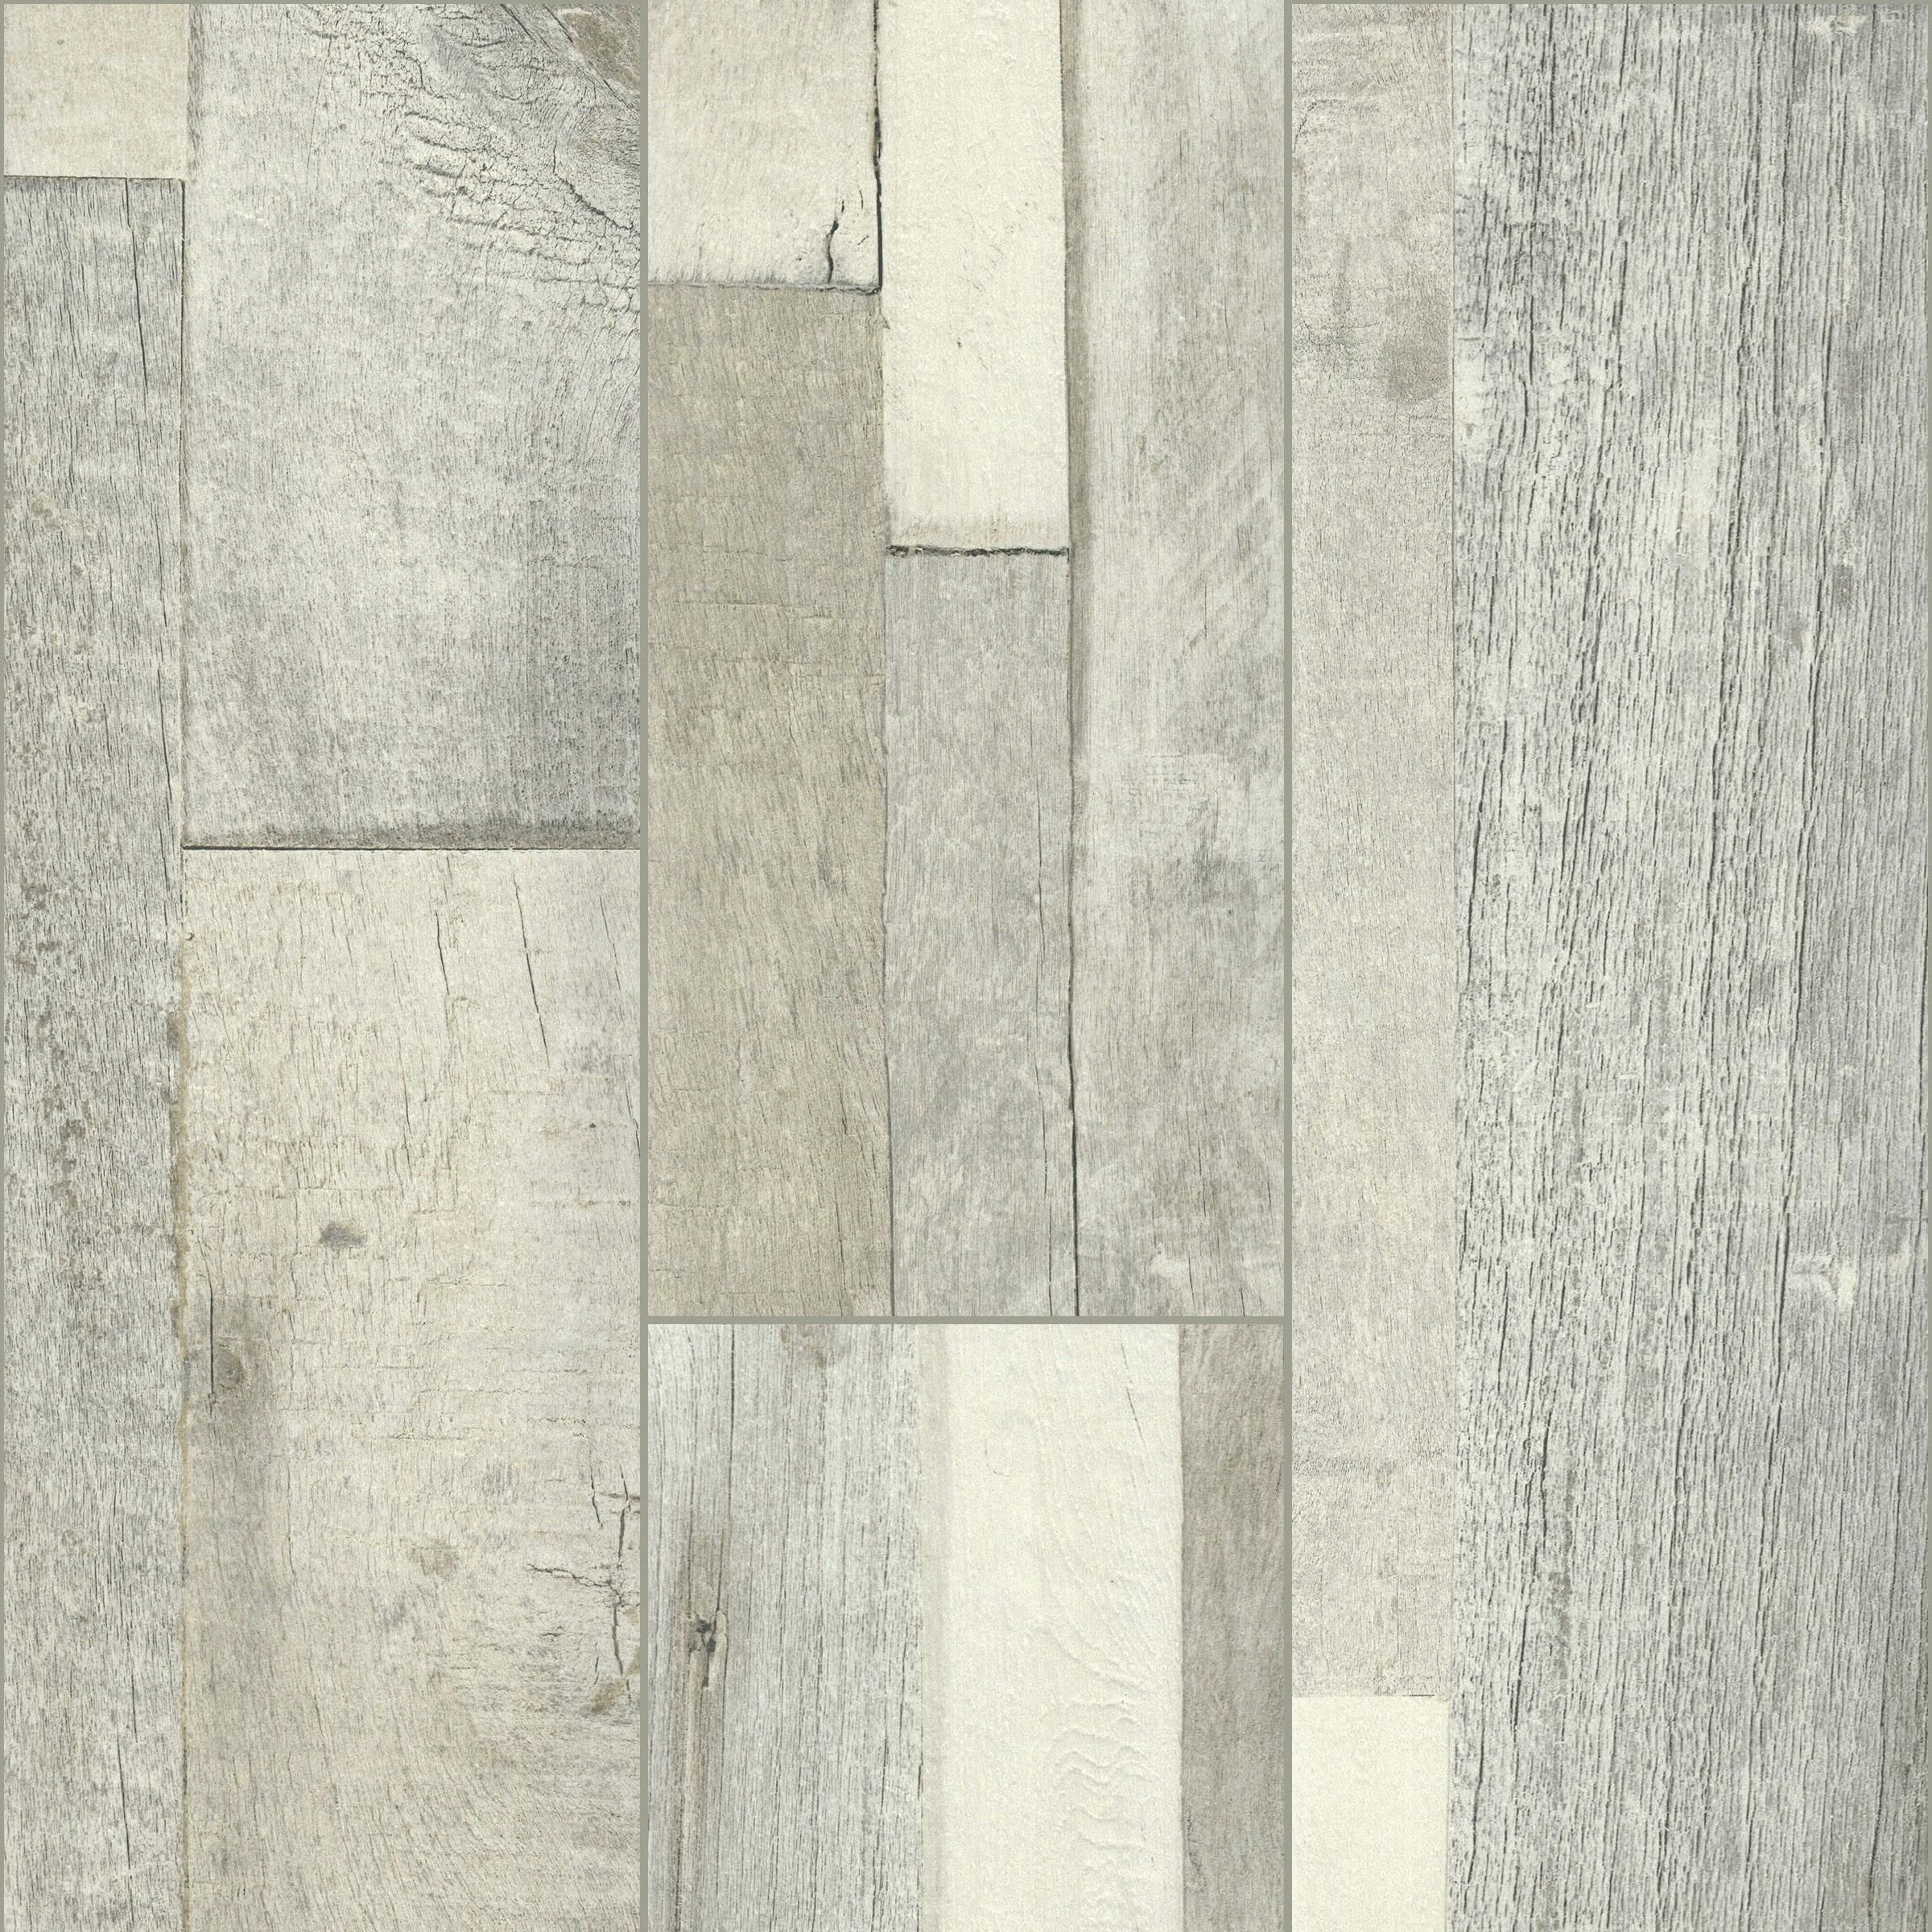 Florim Wood Medley White 8 X 48 Glazed Porcelain Tile